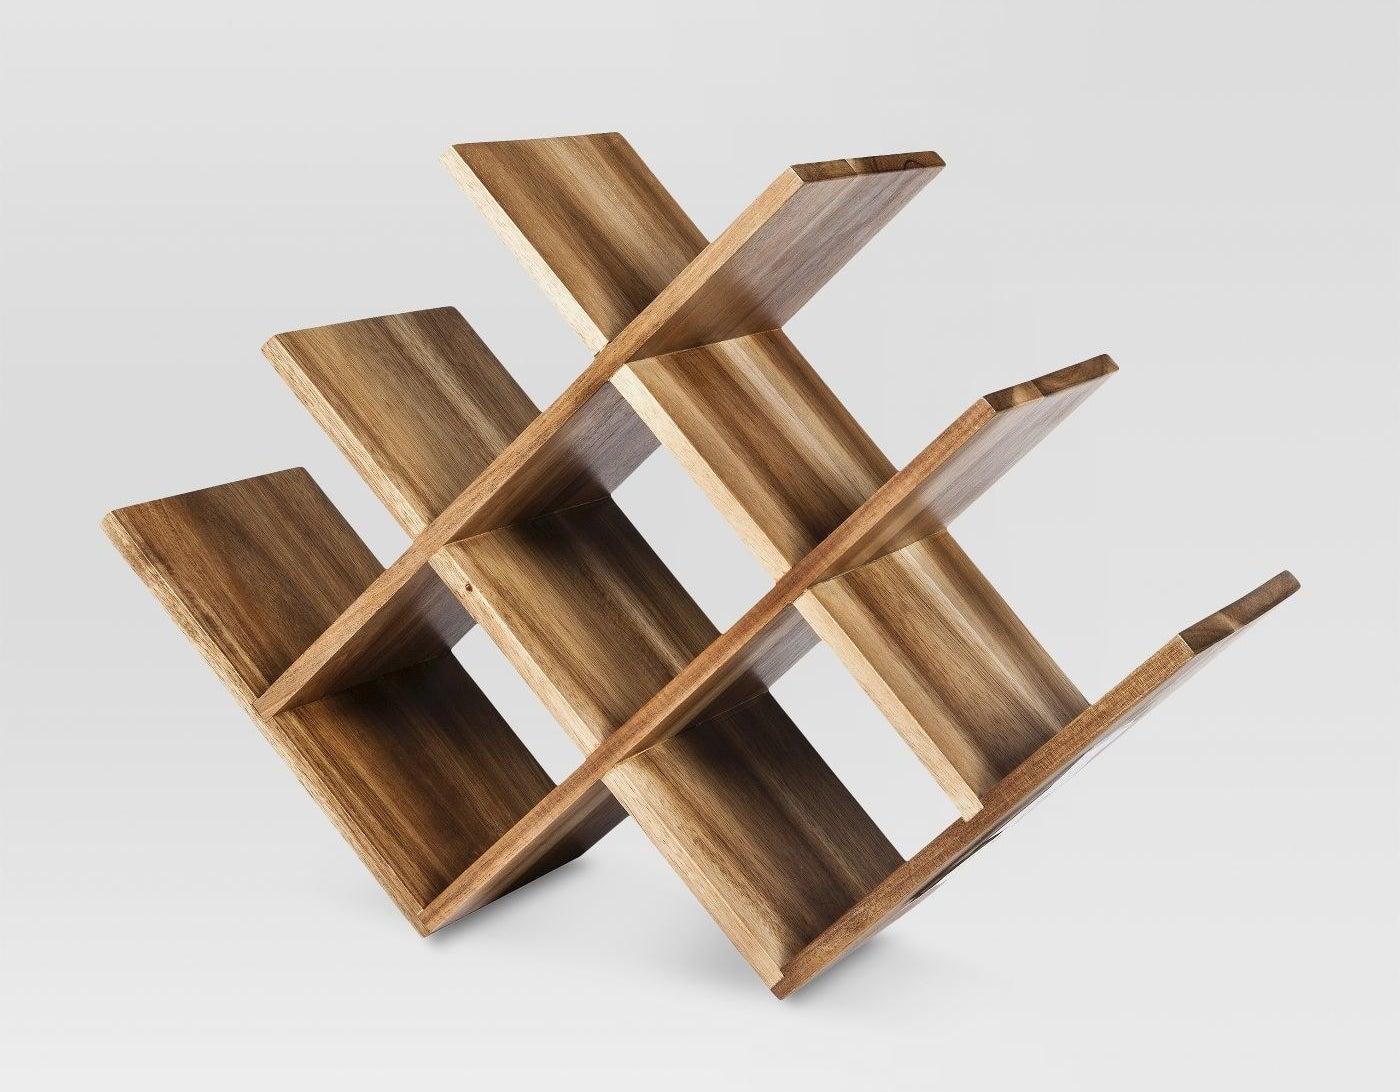 A wooden wine rack